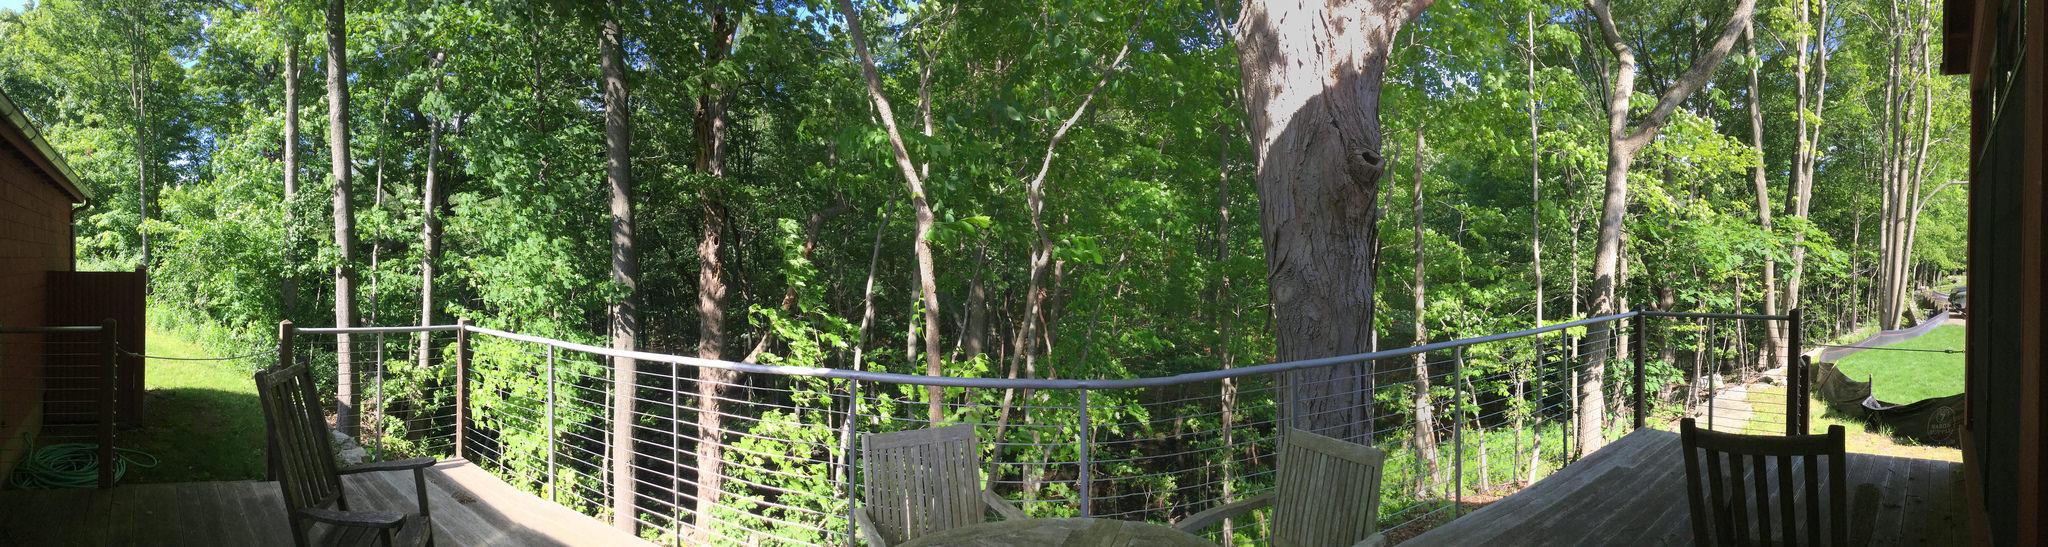 Weir Farm Art Center - studio porch view